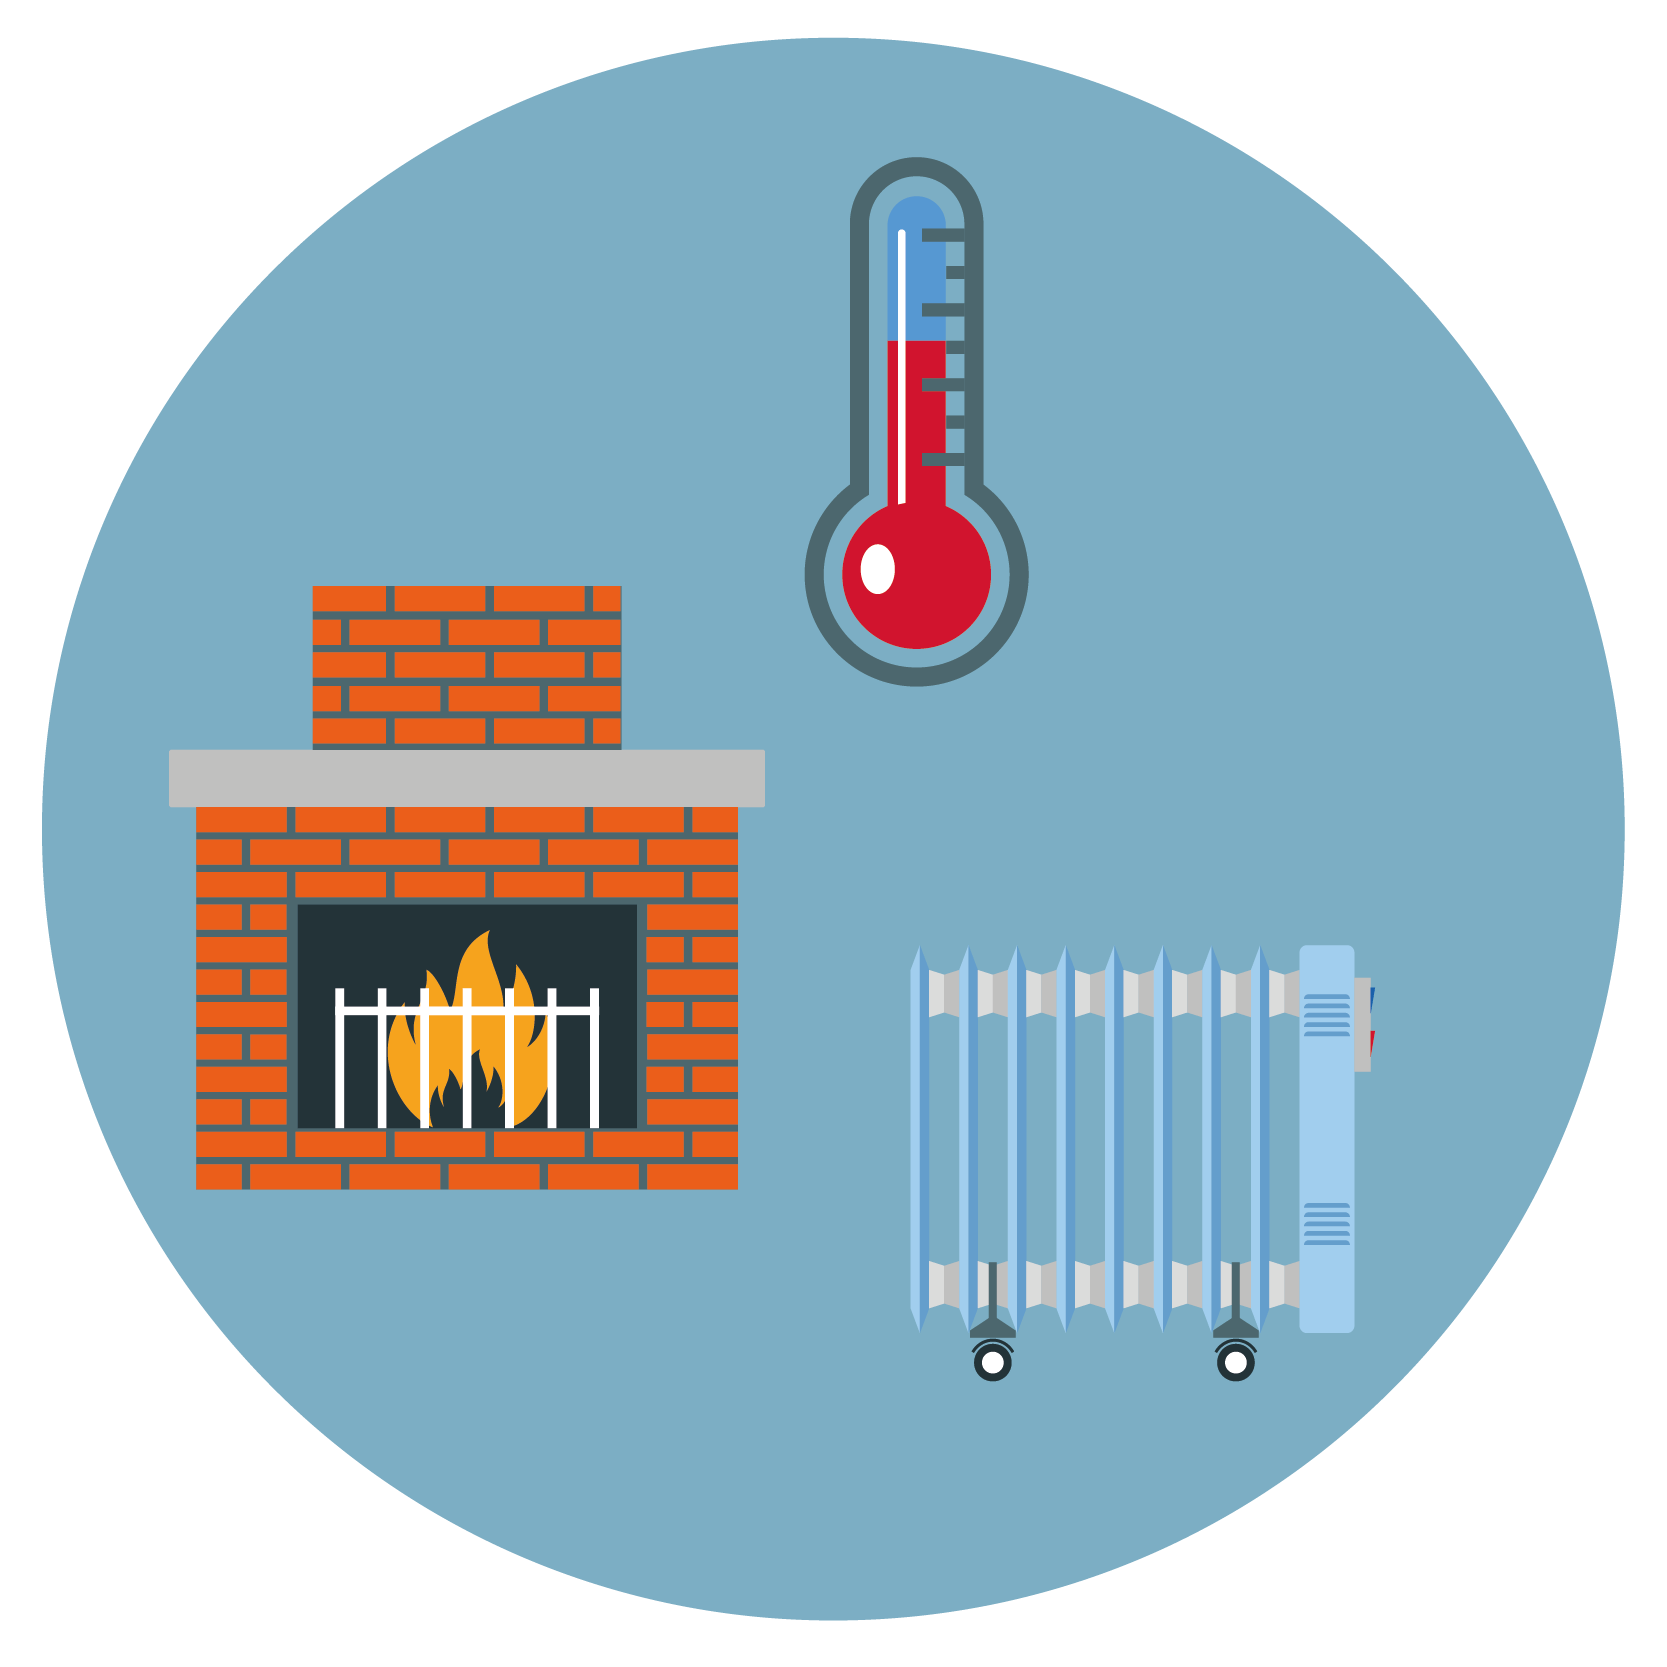 Etre autonome en chauffage